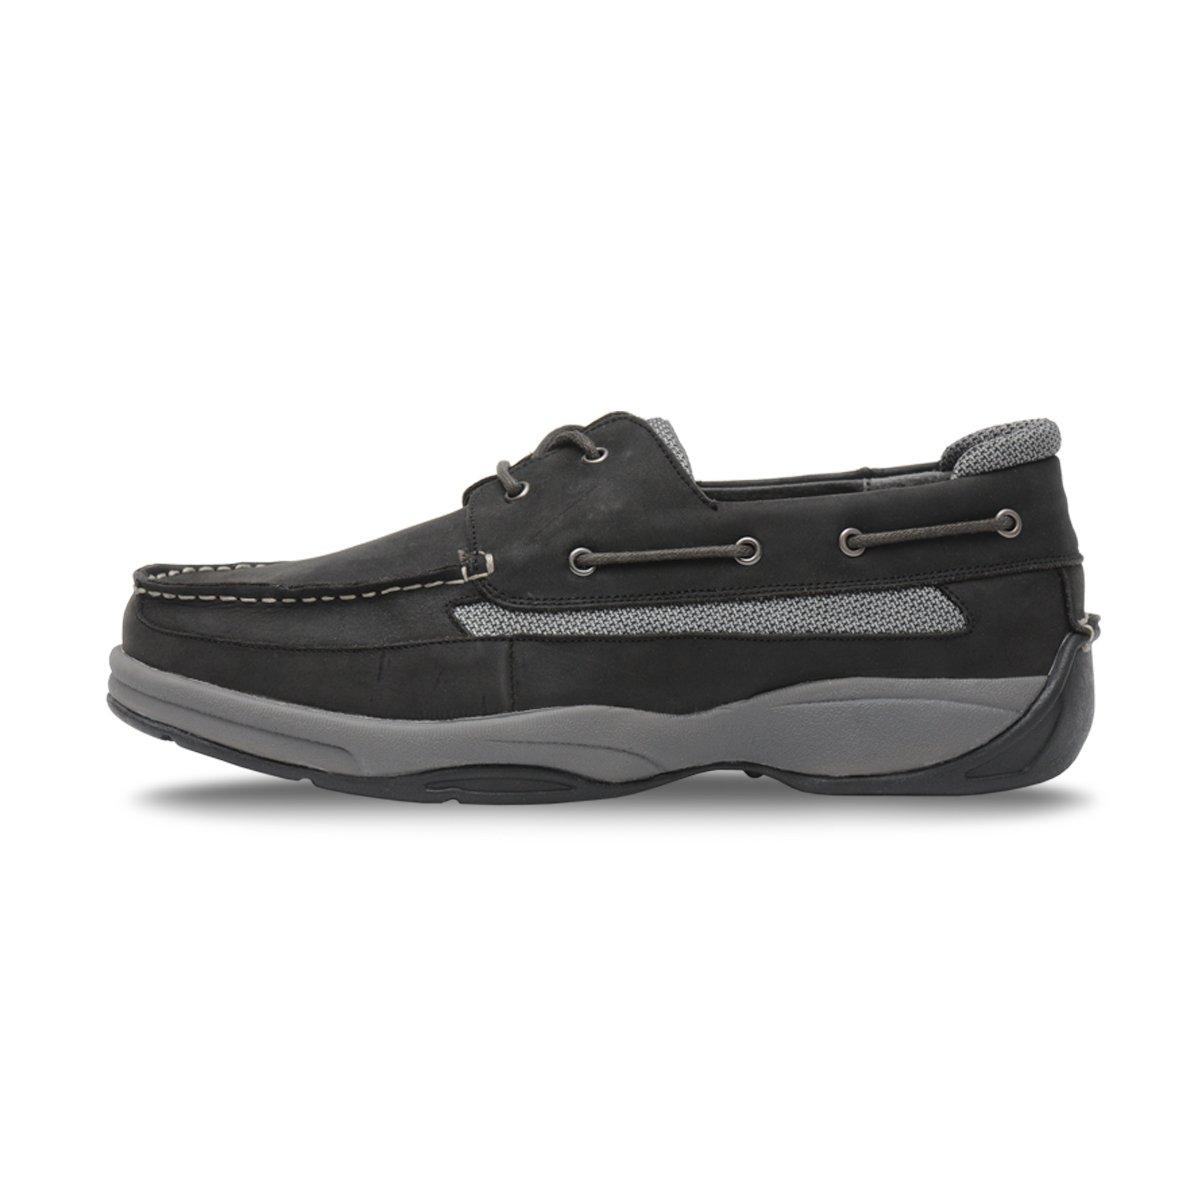 Ped-Lite Men's Neuropathy Boat Shoe - Oliver 14 D(M) US|Black